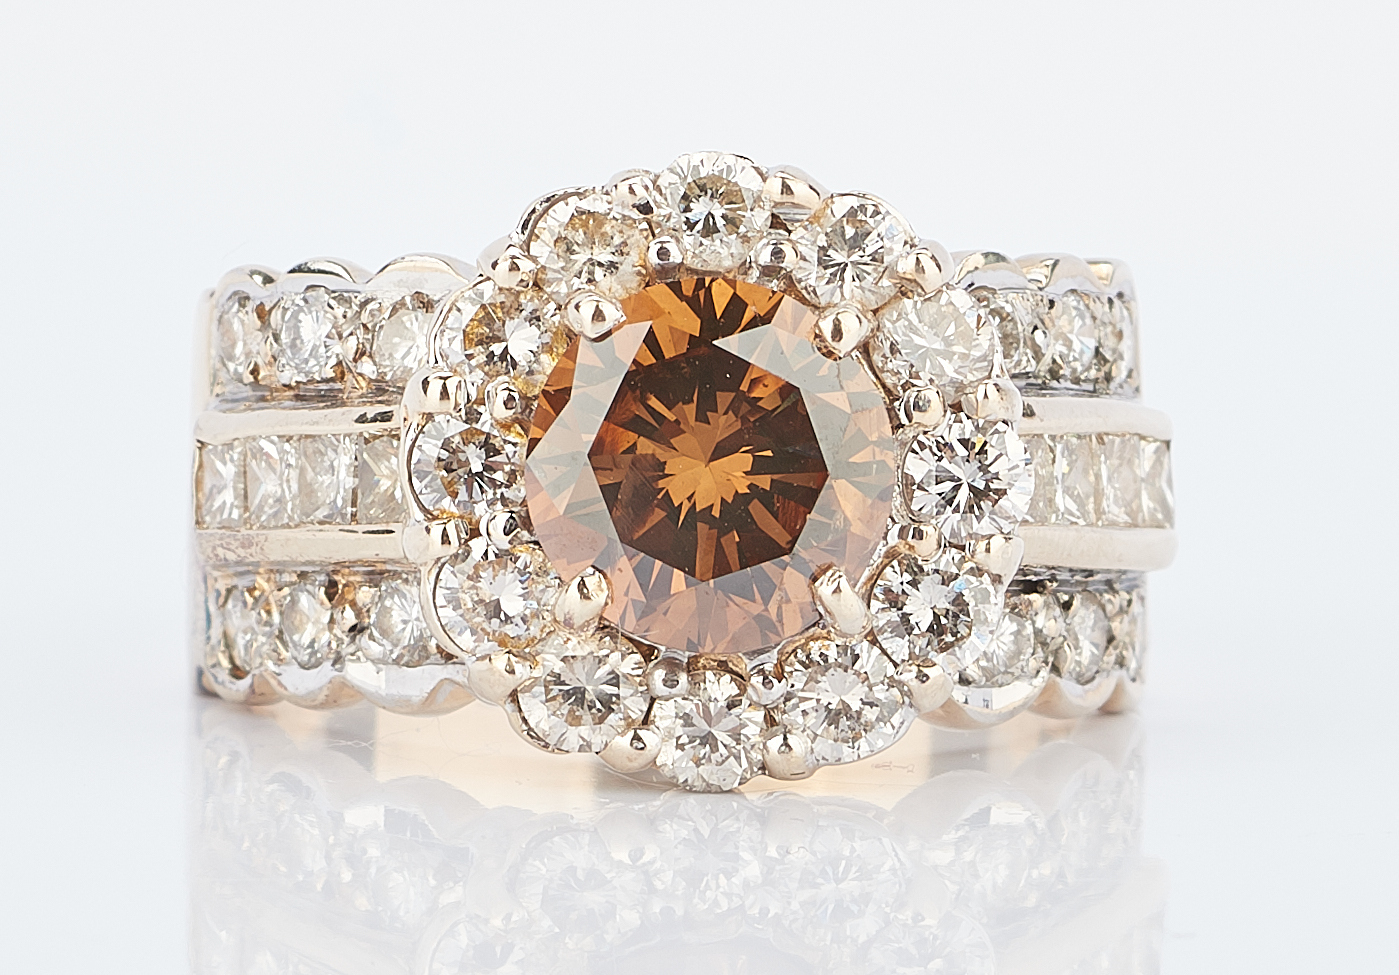 Lot 213: 14K 2.2 Carat Chocolate Diamond Ring